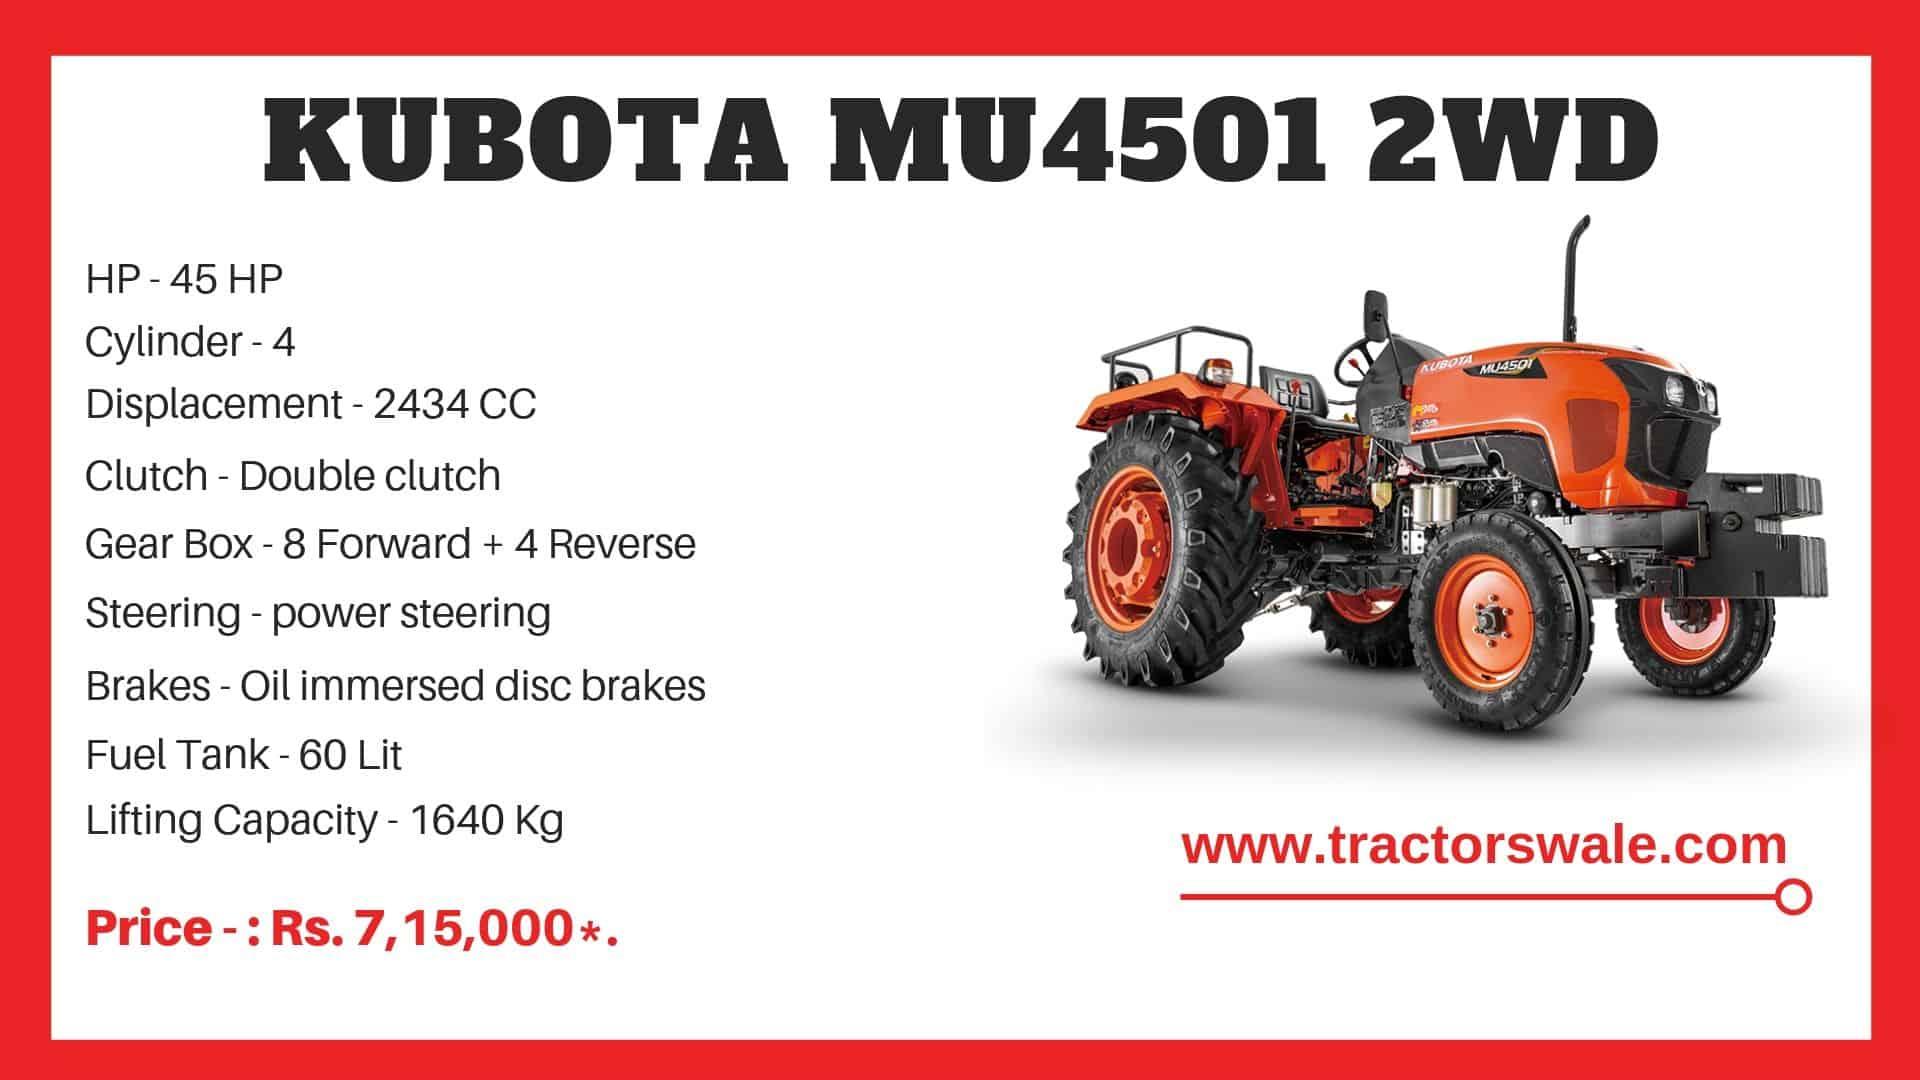 Kubota MU4501 2WD tractor specifications